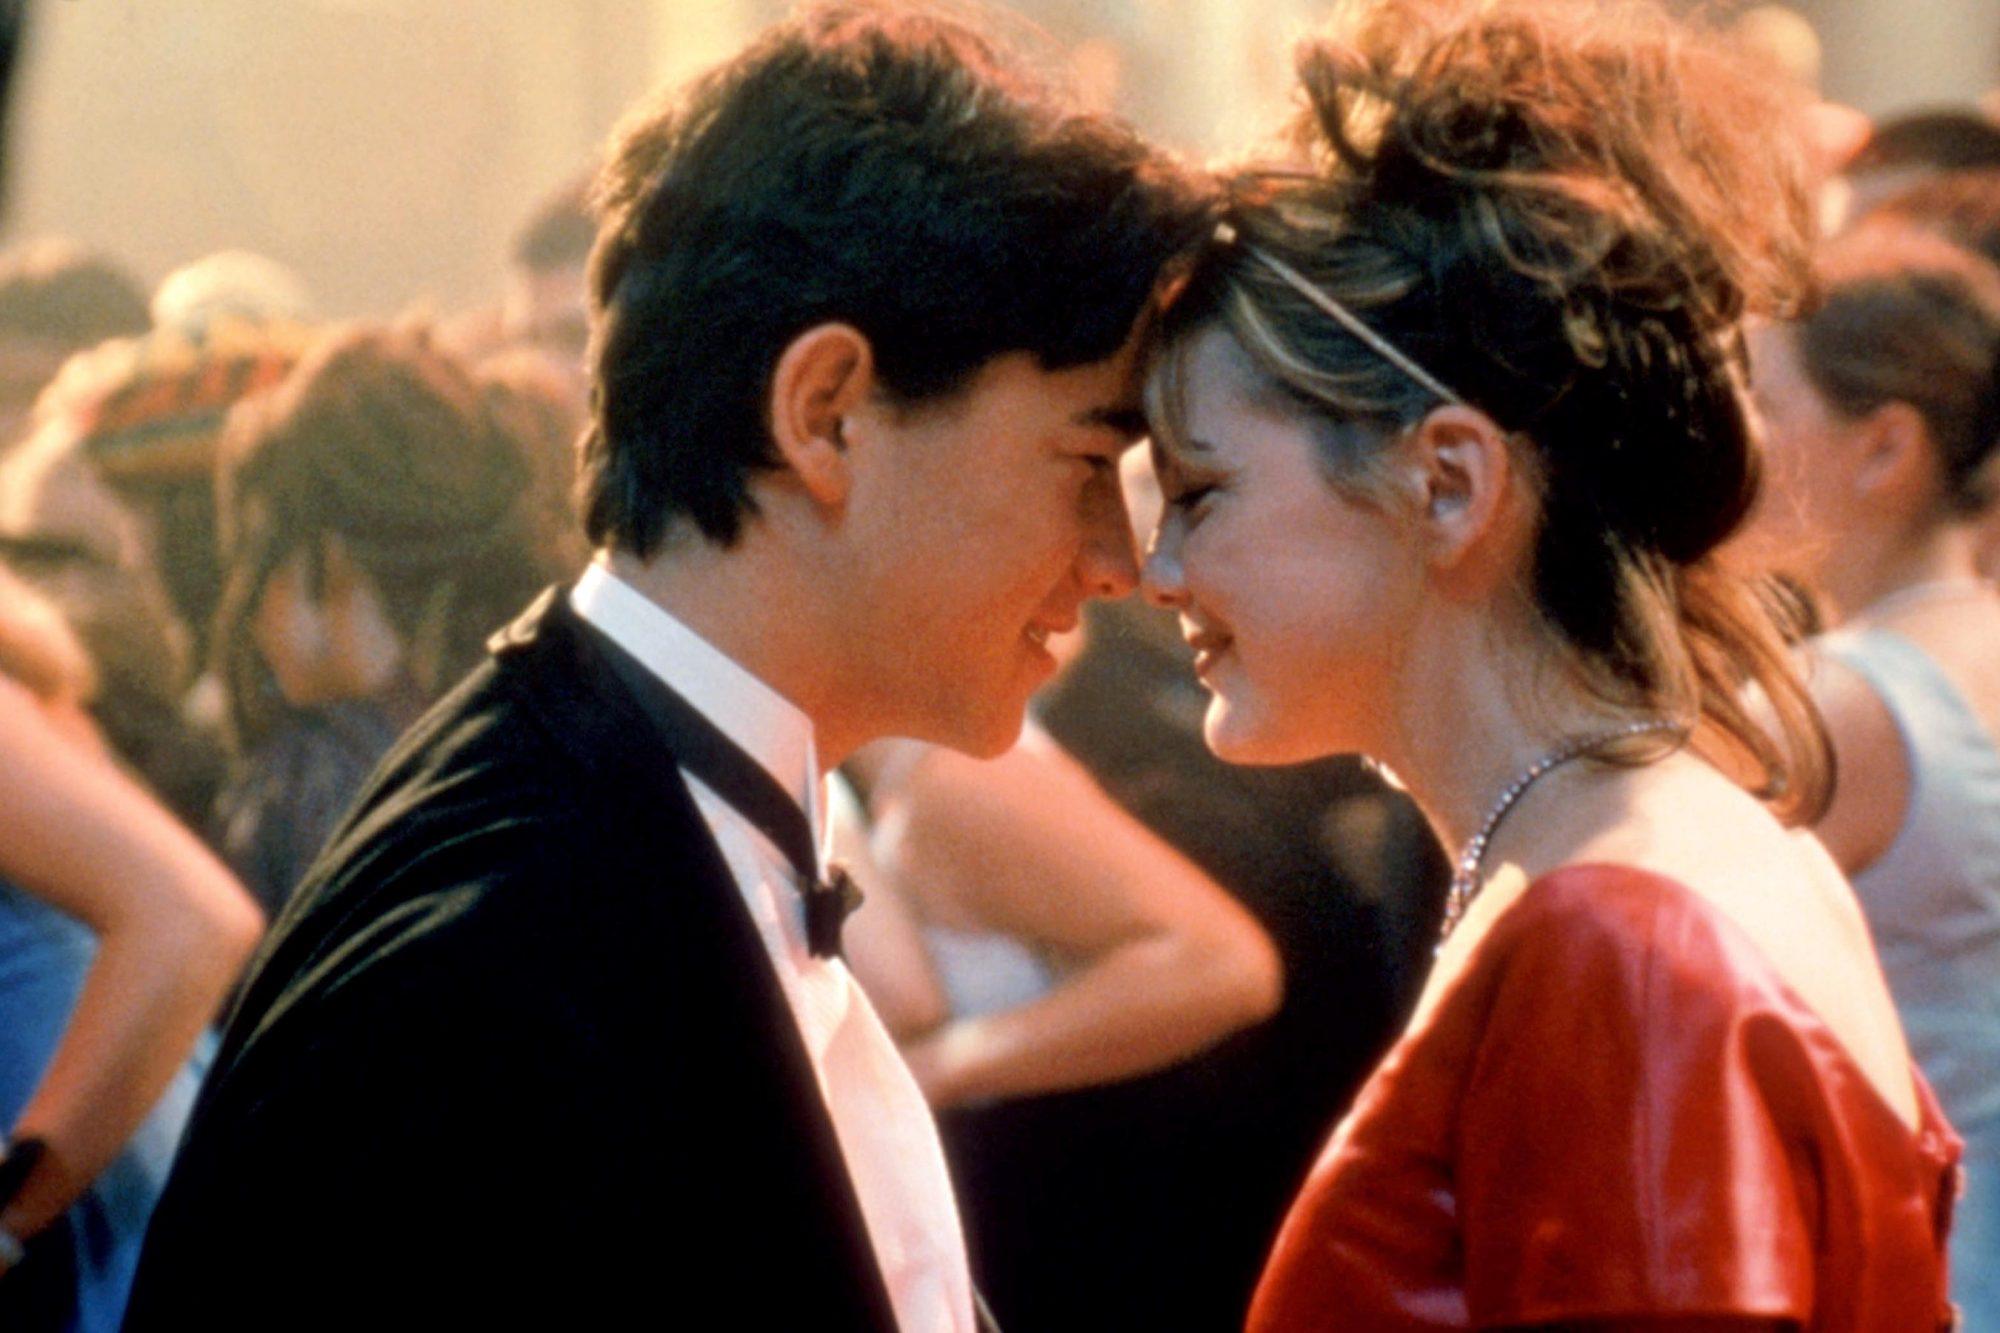 10 THINGS I HATE ABOUT YOU, Joseph Gordon-Levitt, Larisa Oleynik, 1999. (c) Touchstone Pictures/ Cou